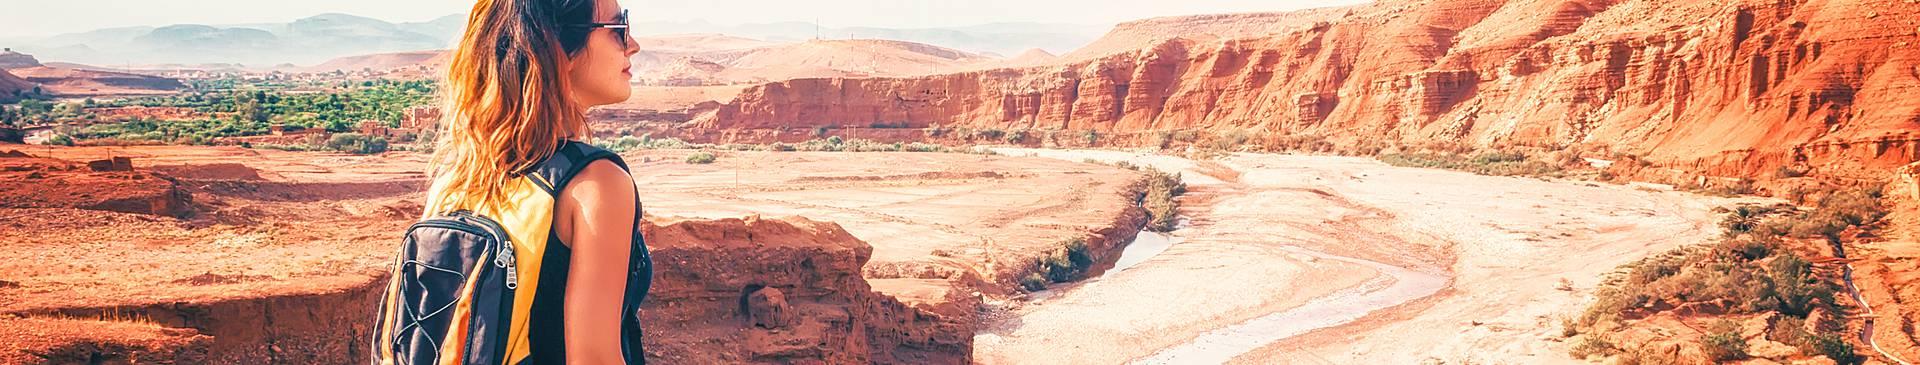 Morocco adventure trips